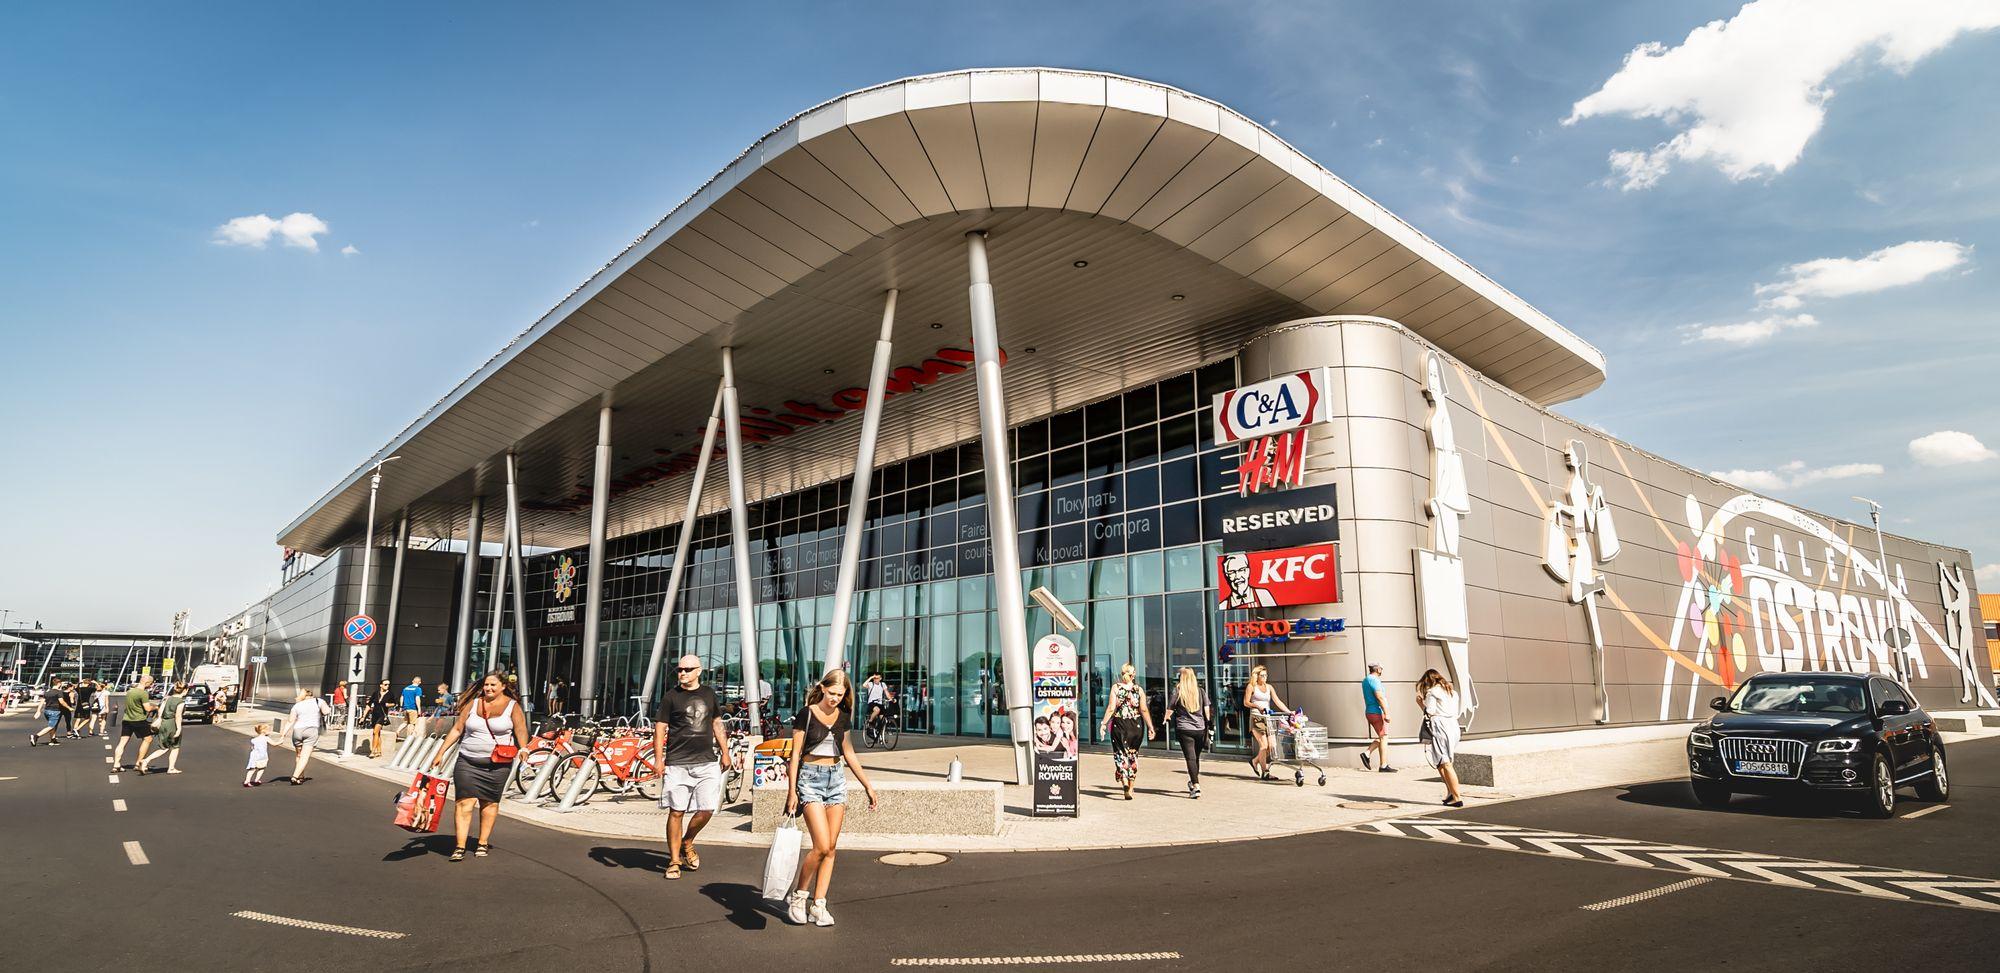 Sesja fotograficzna centrum handlowego - Galeria Ostrovia - TOP - Impatientstudio.pl